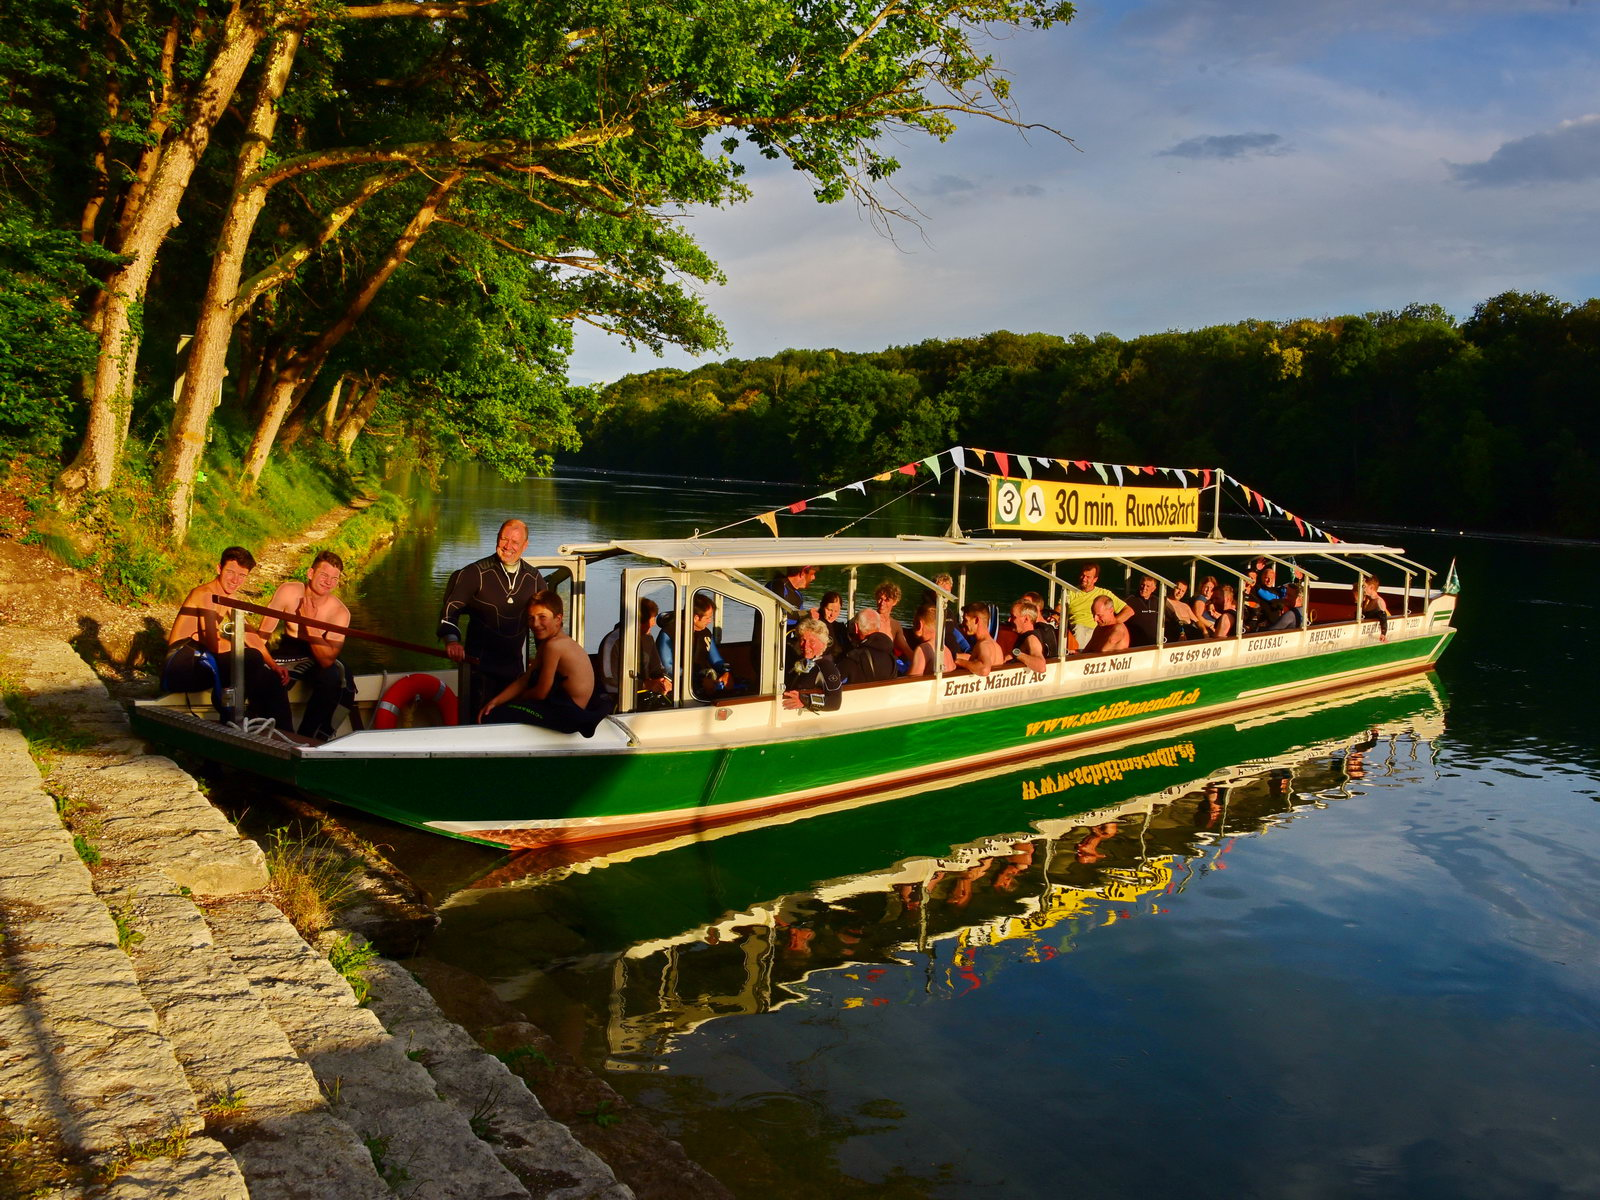 09.07.2021 | Bootstour & Flusstauchgang & BBQ | Rhein